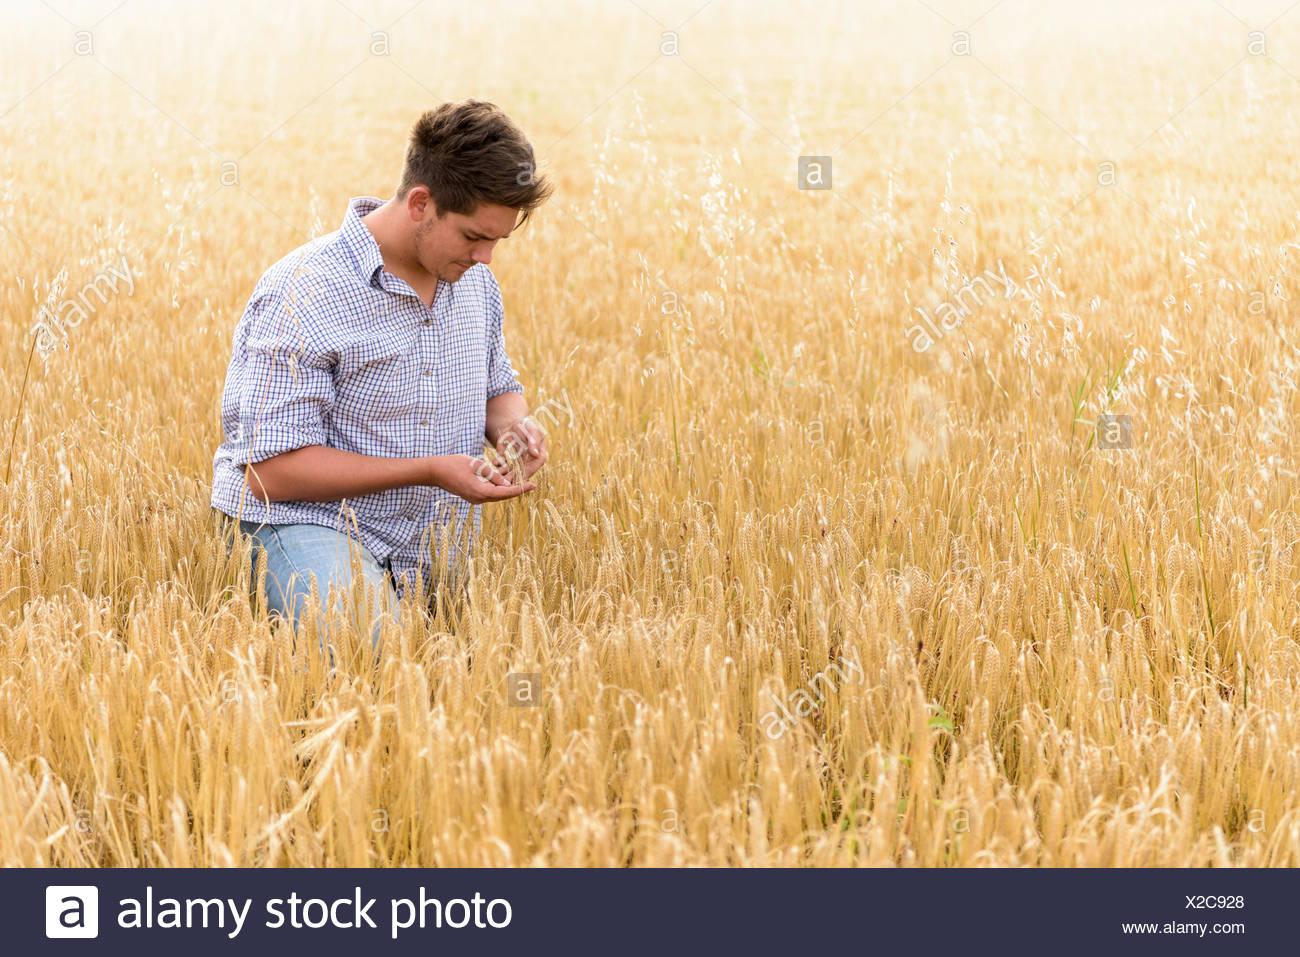 Farmer inspecting crop of organic barley in field - Stock Image